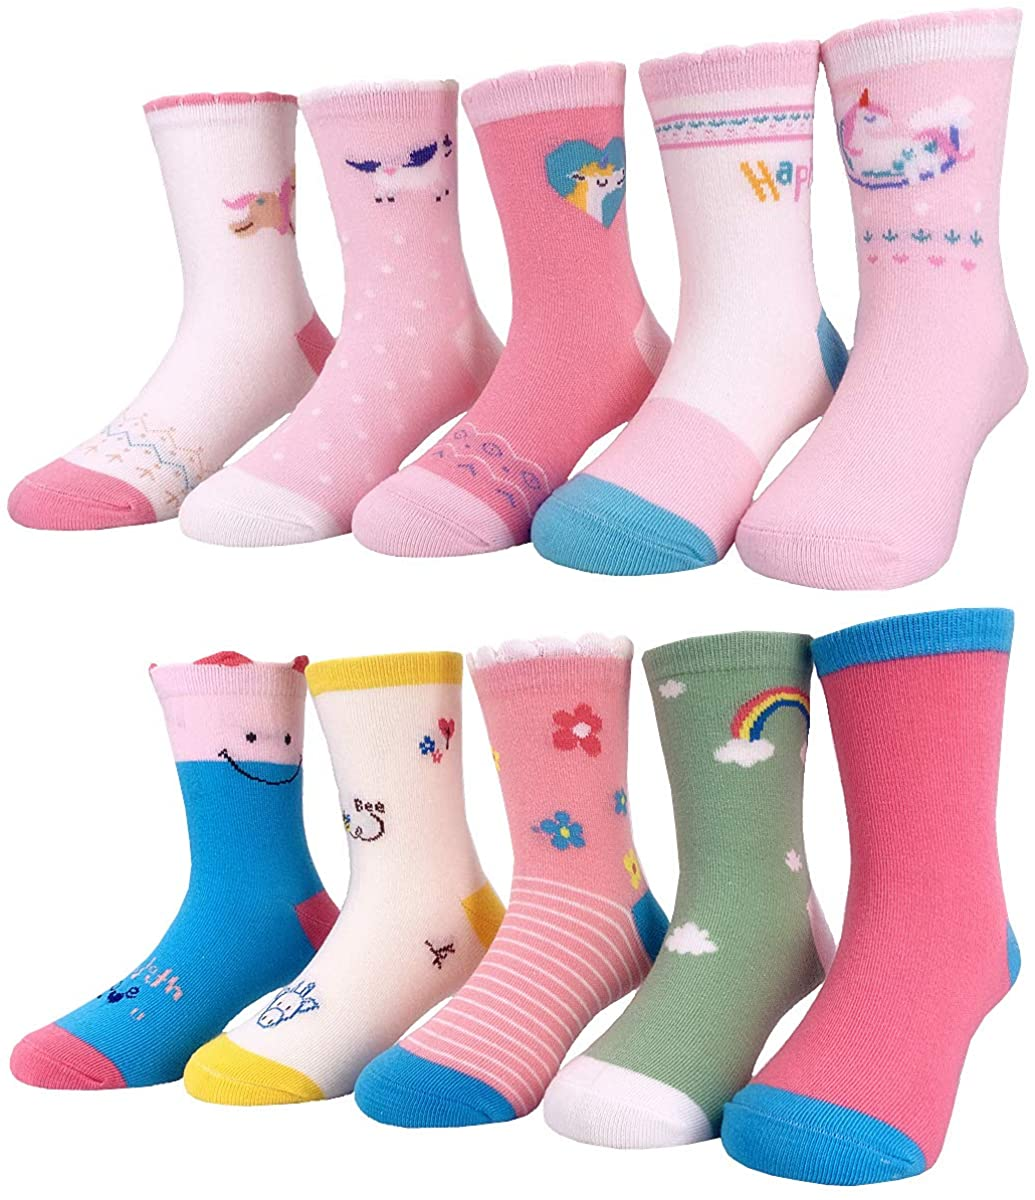 Toddler Little Girls Cotton Crew Socks 10 Pairs